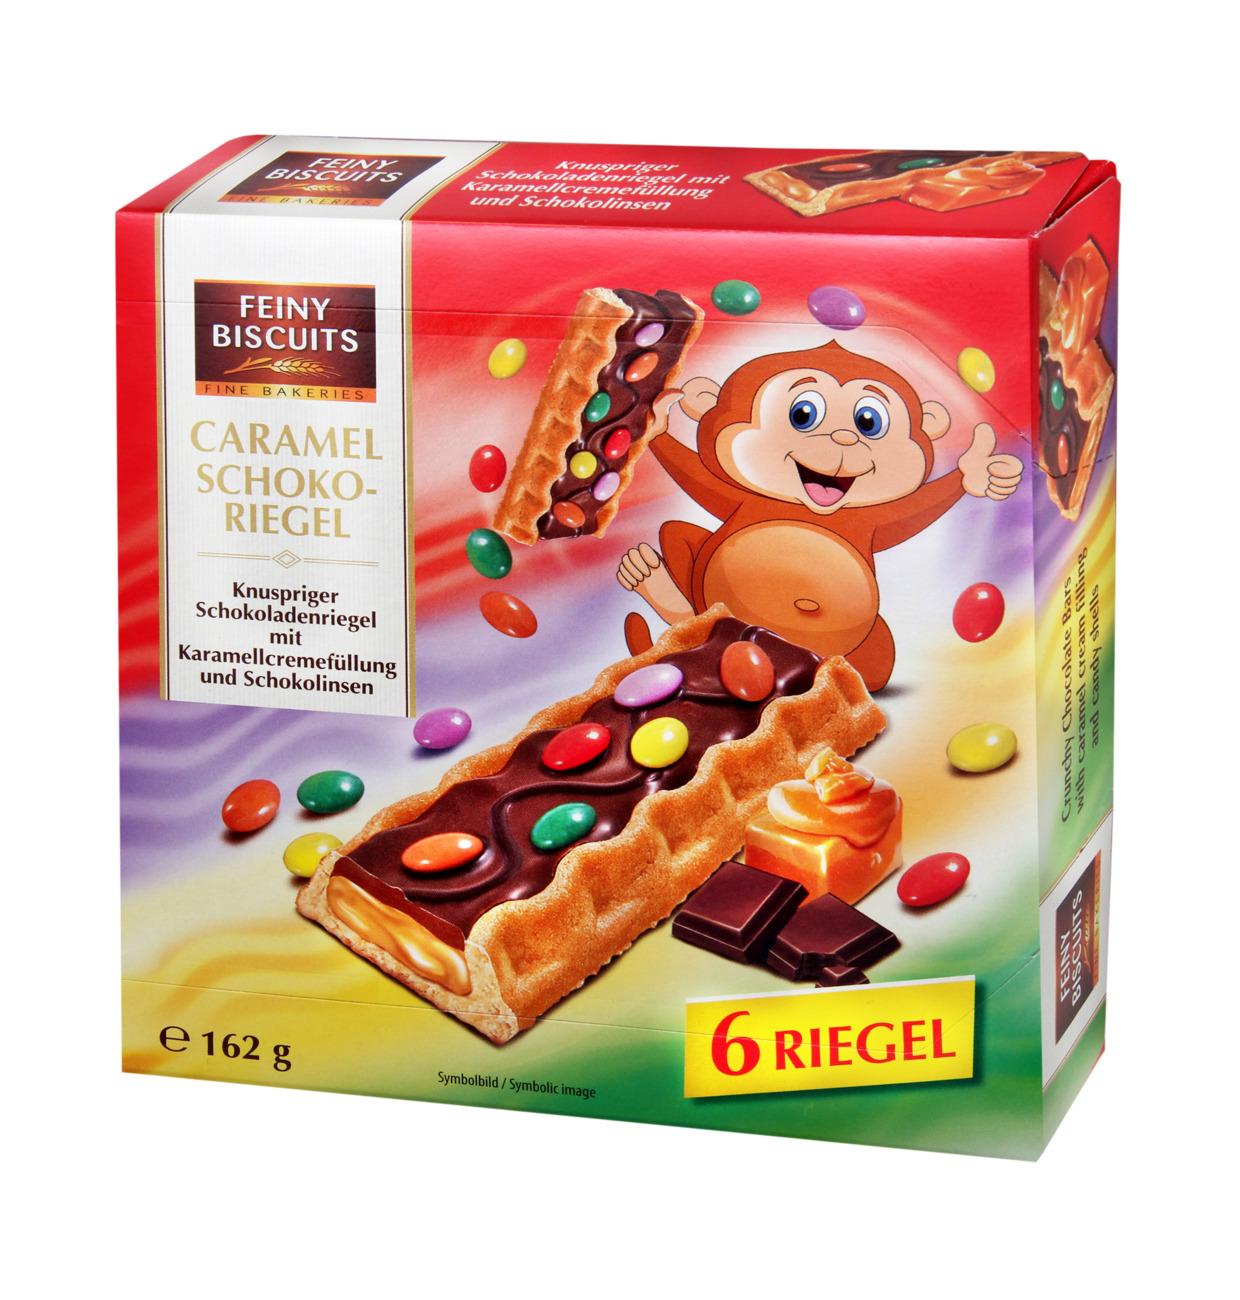 Caramel Schoko-Riegel